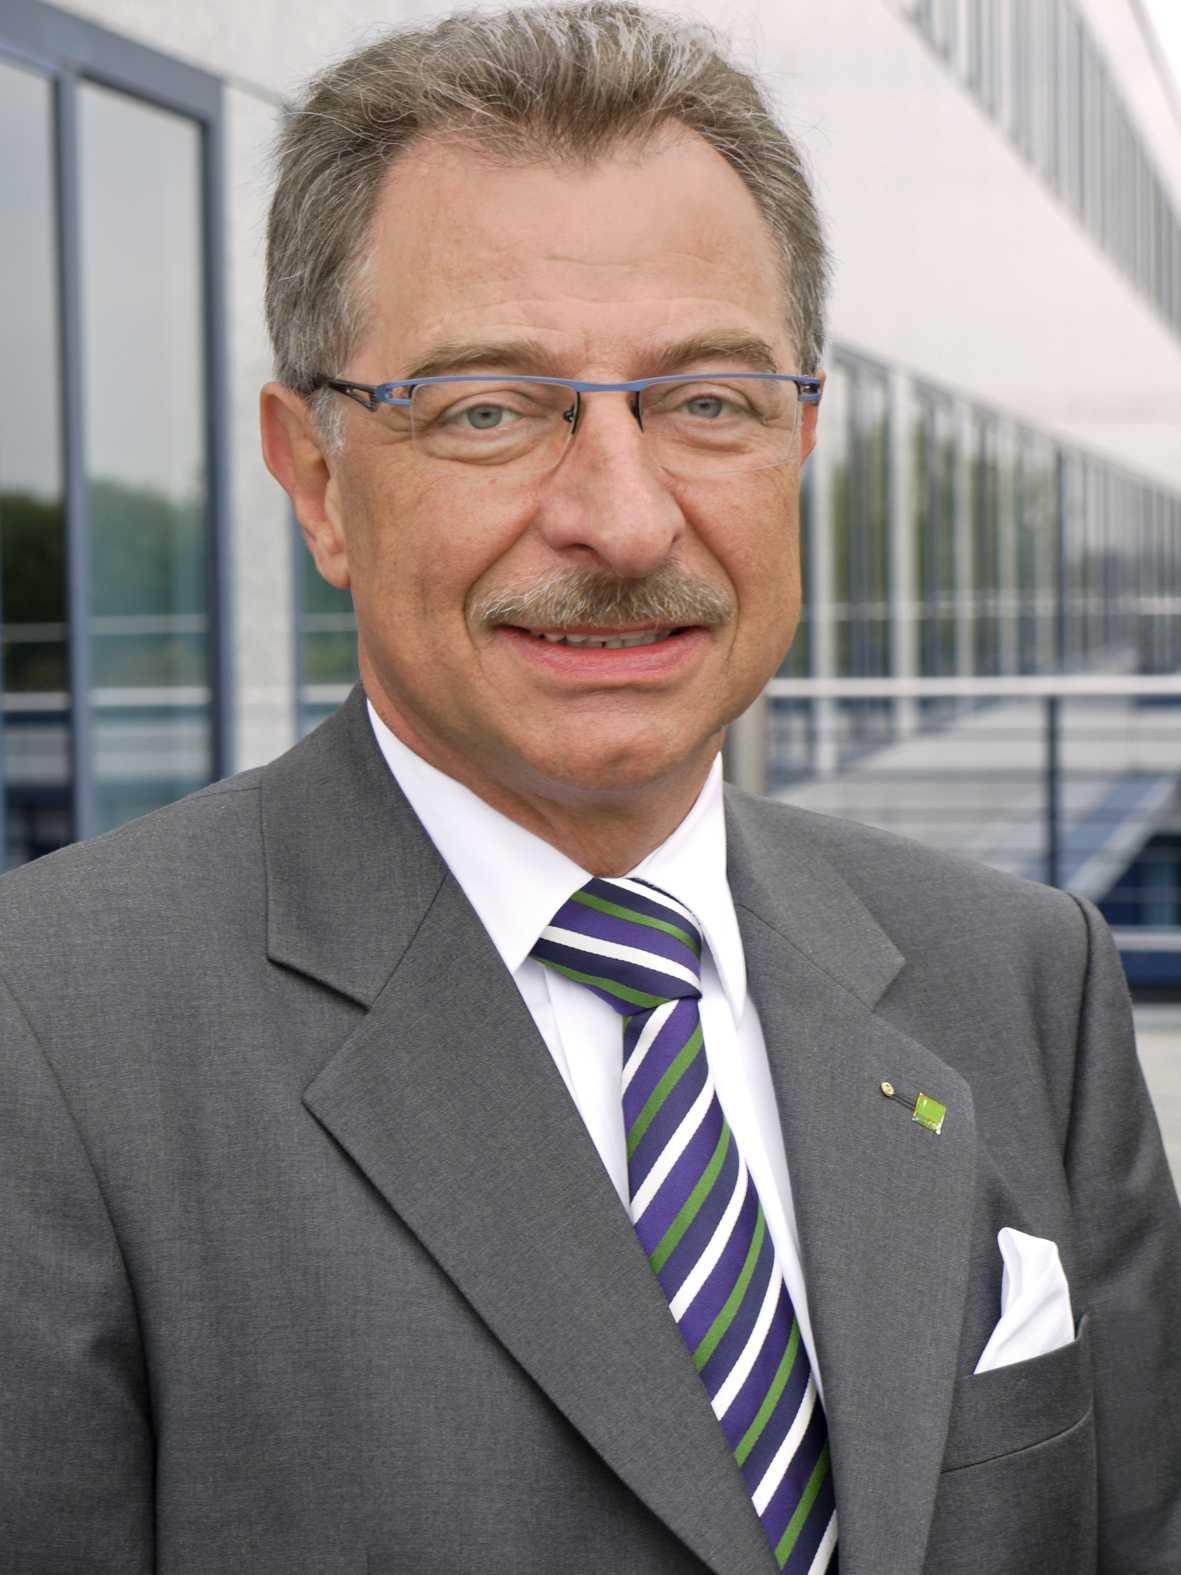 Bitkom- und Datev-Chef Dieter Kempf